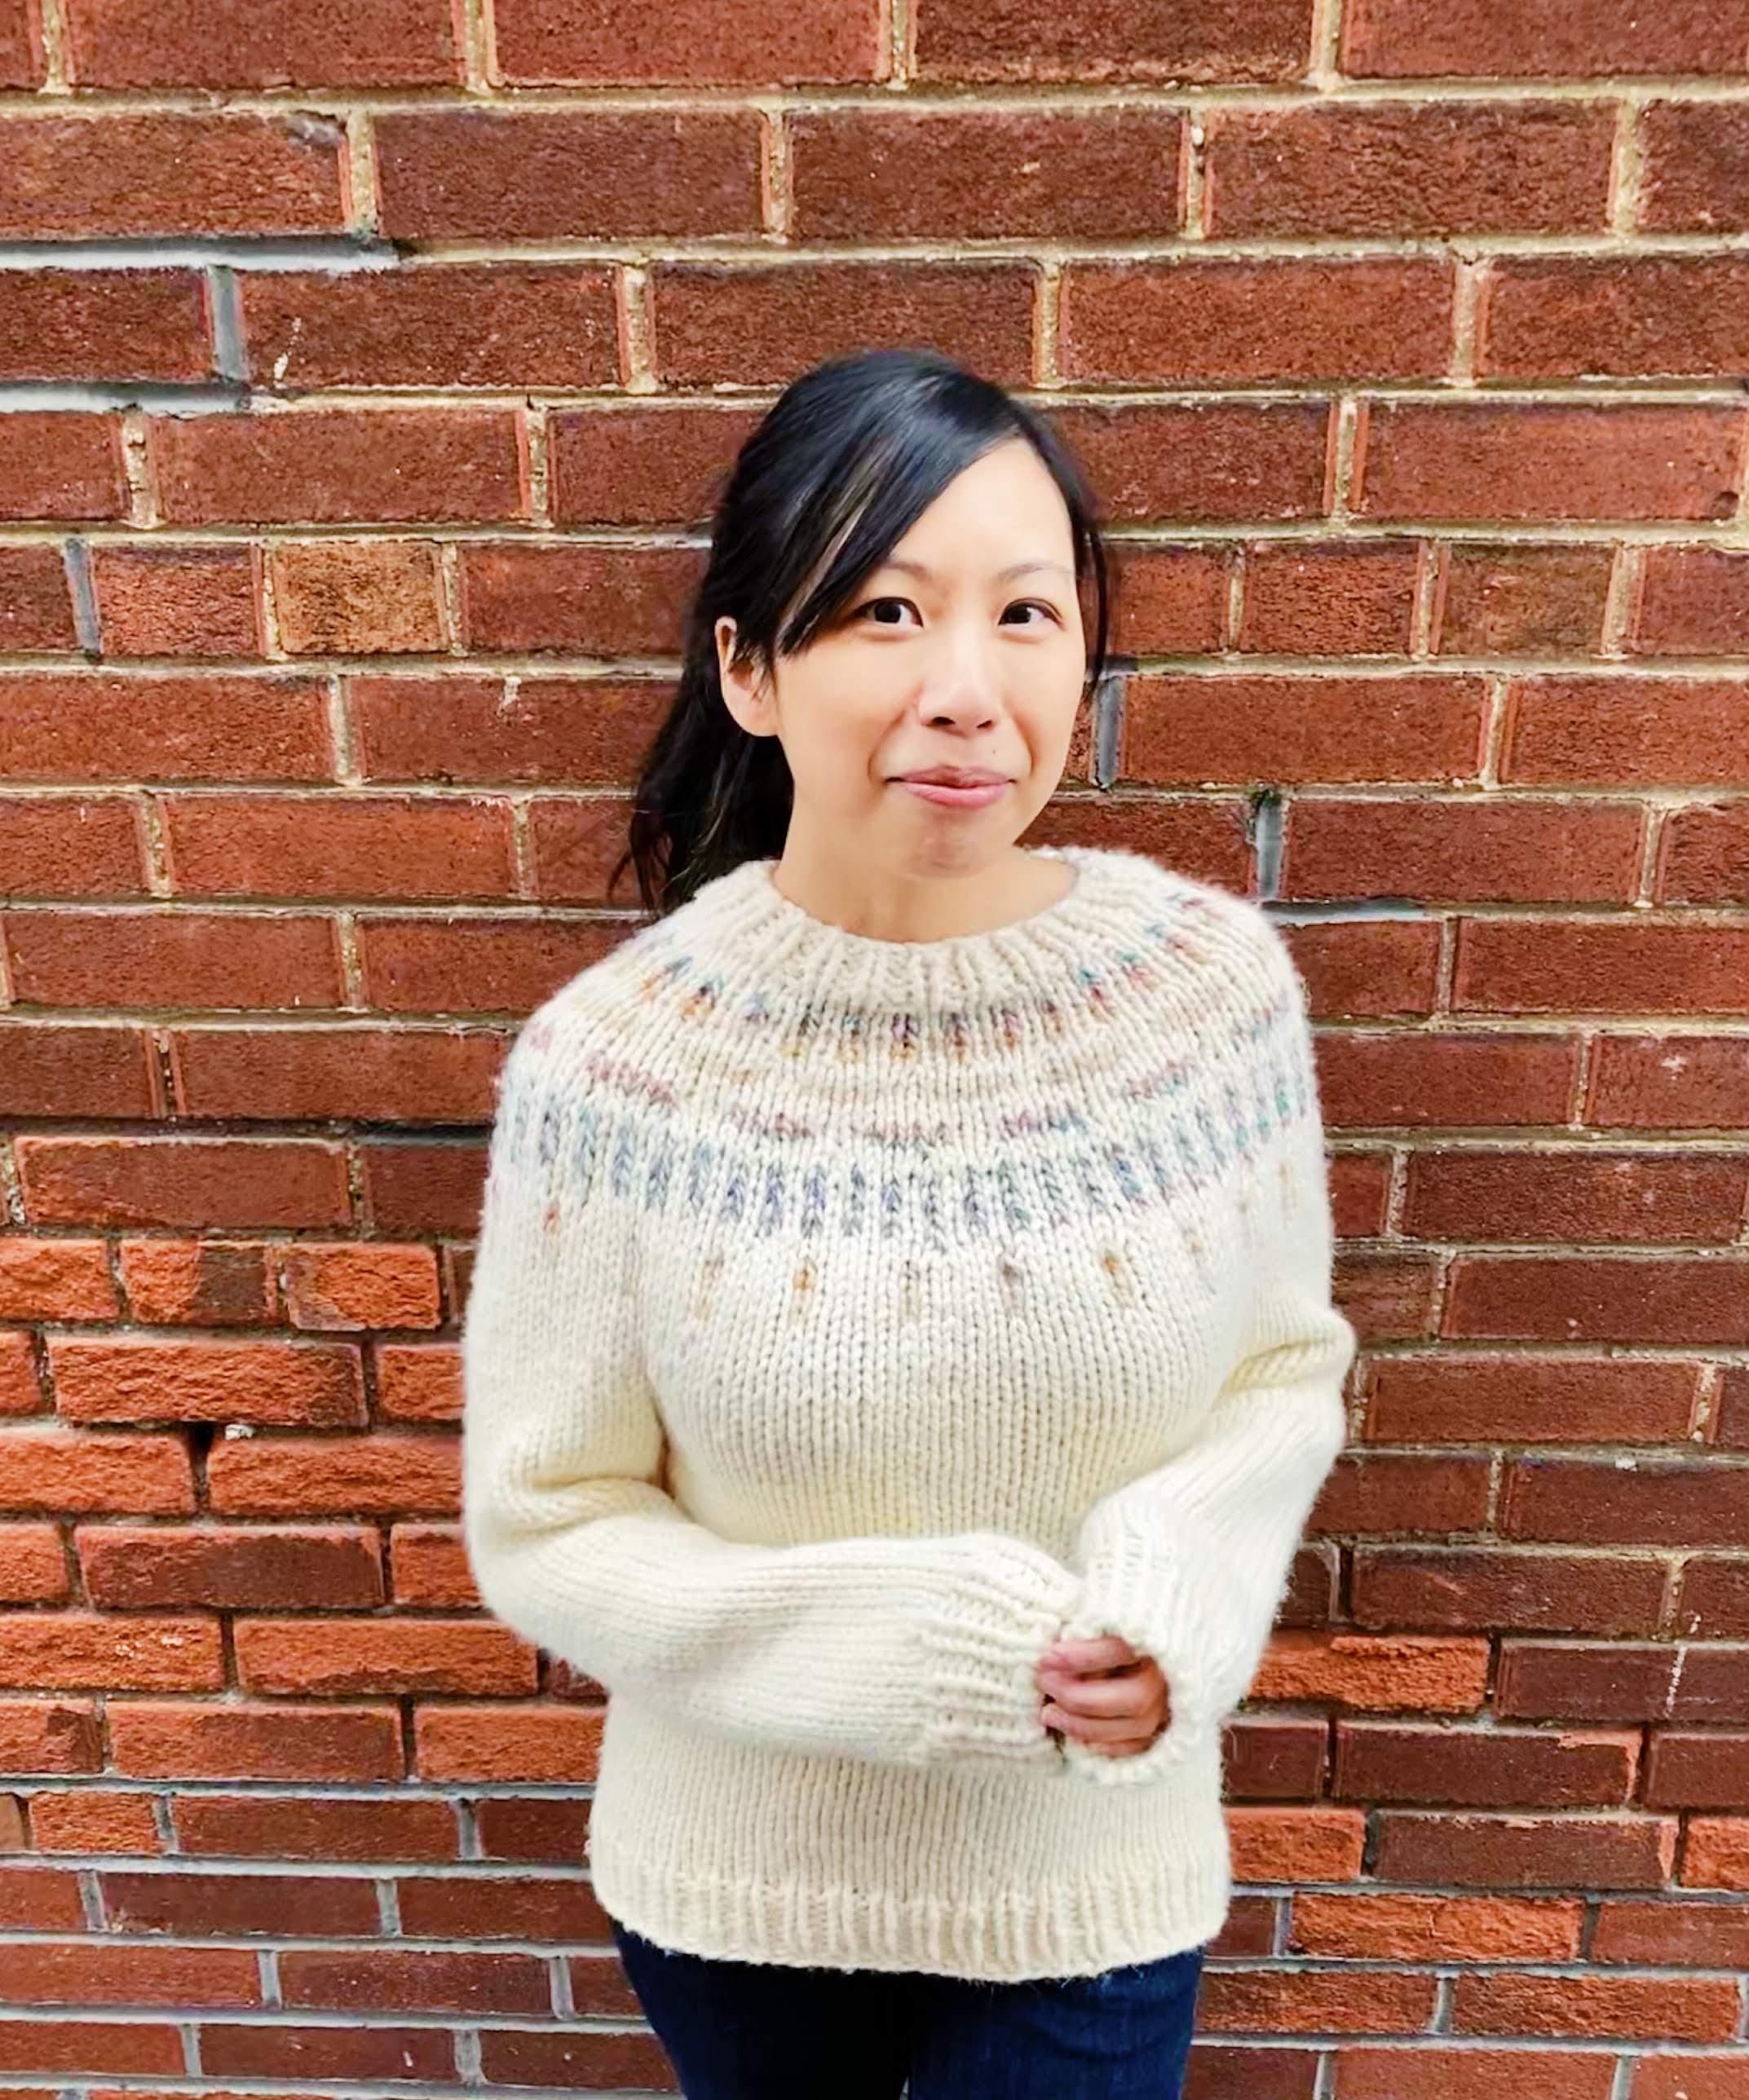 color yoke on cream sweater